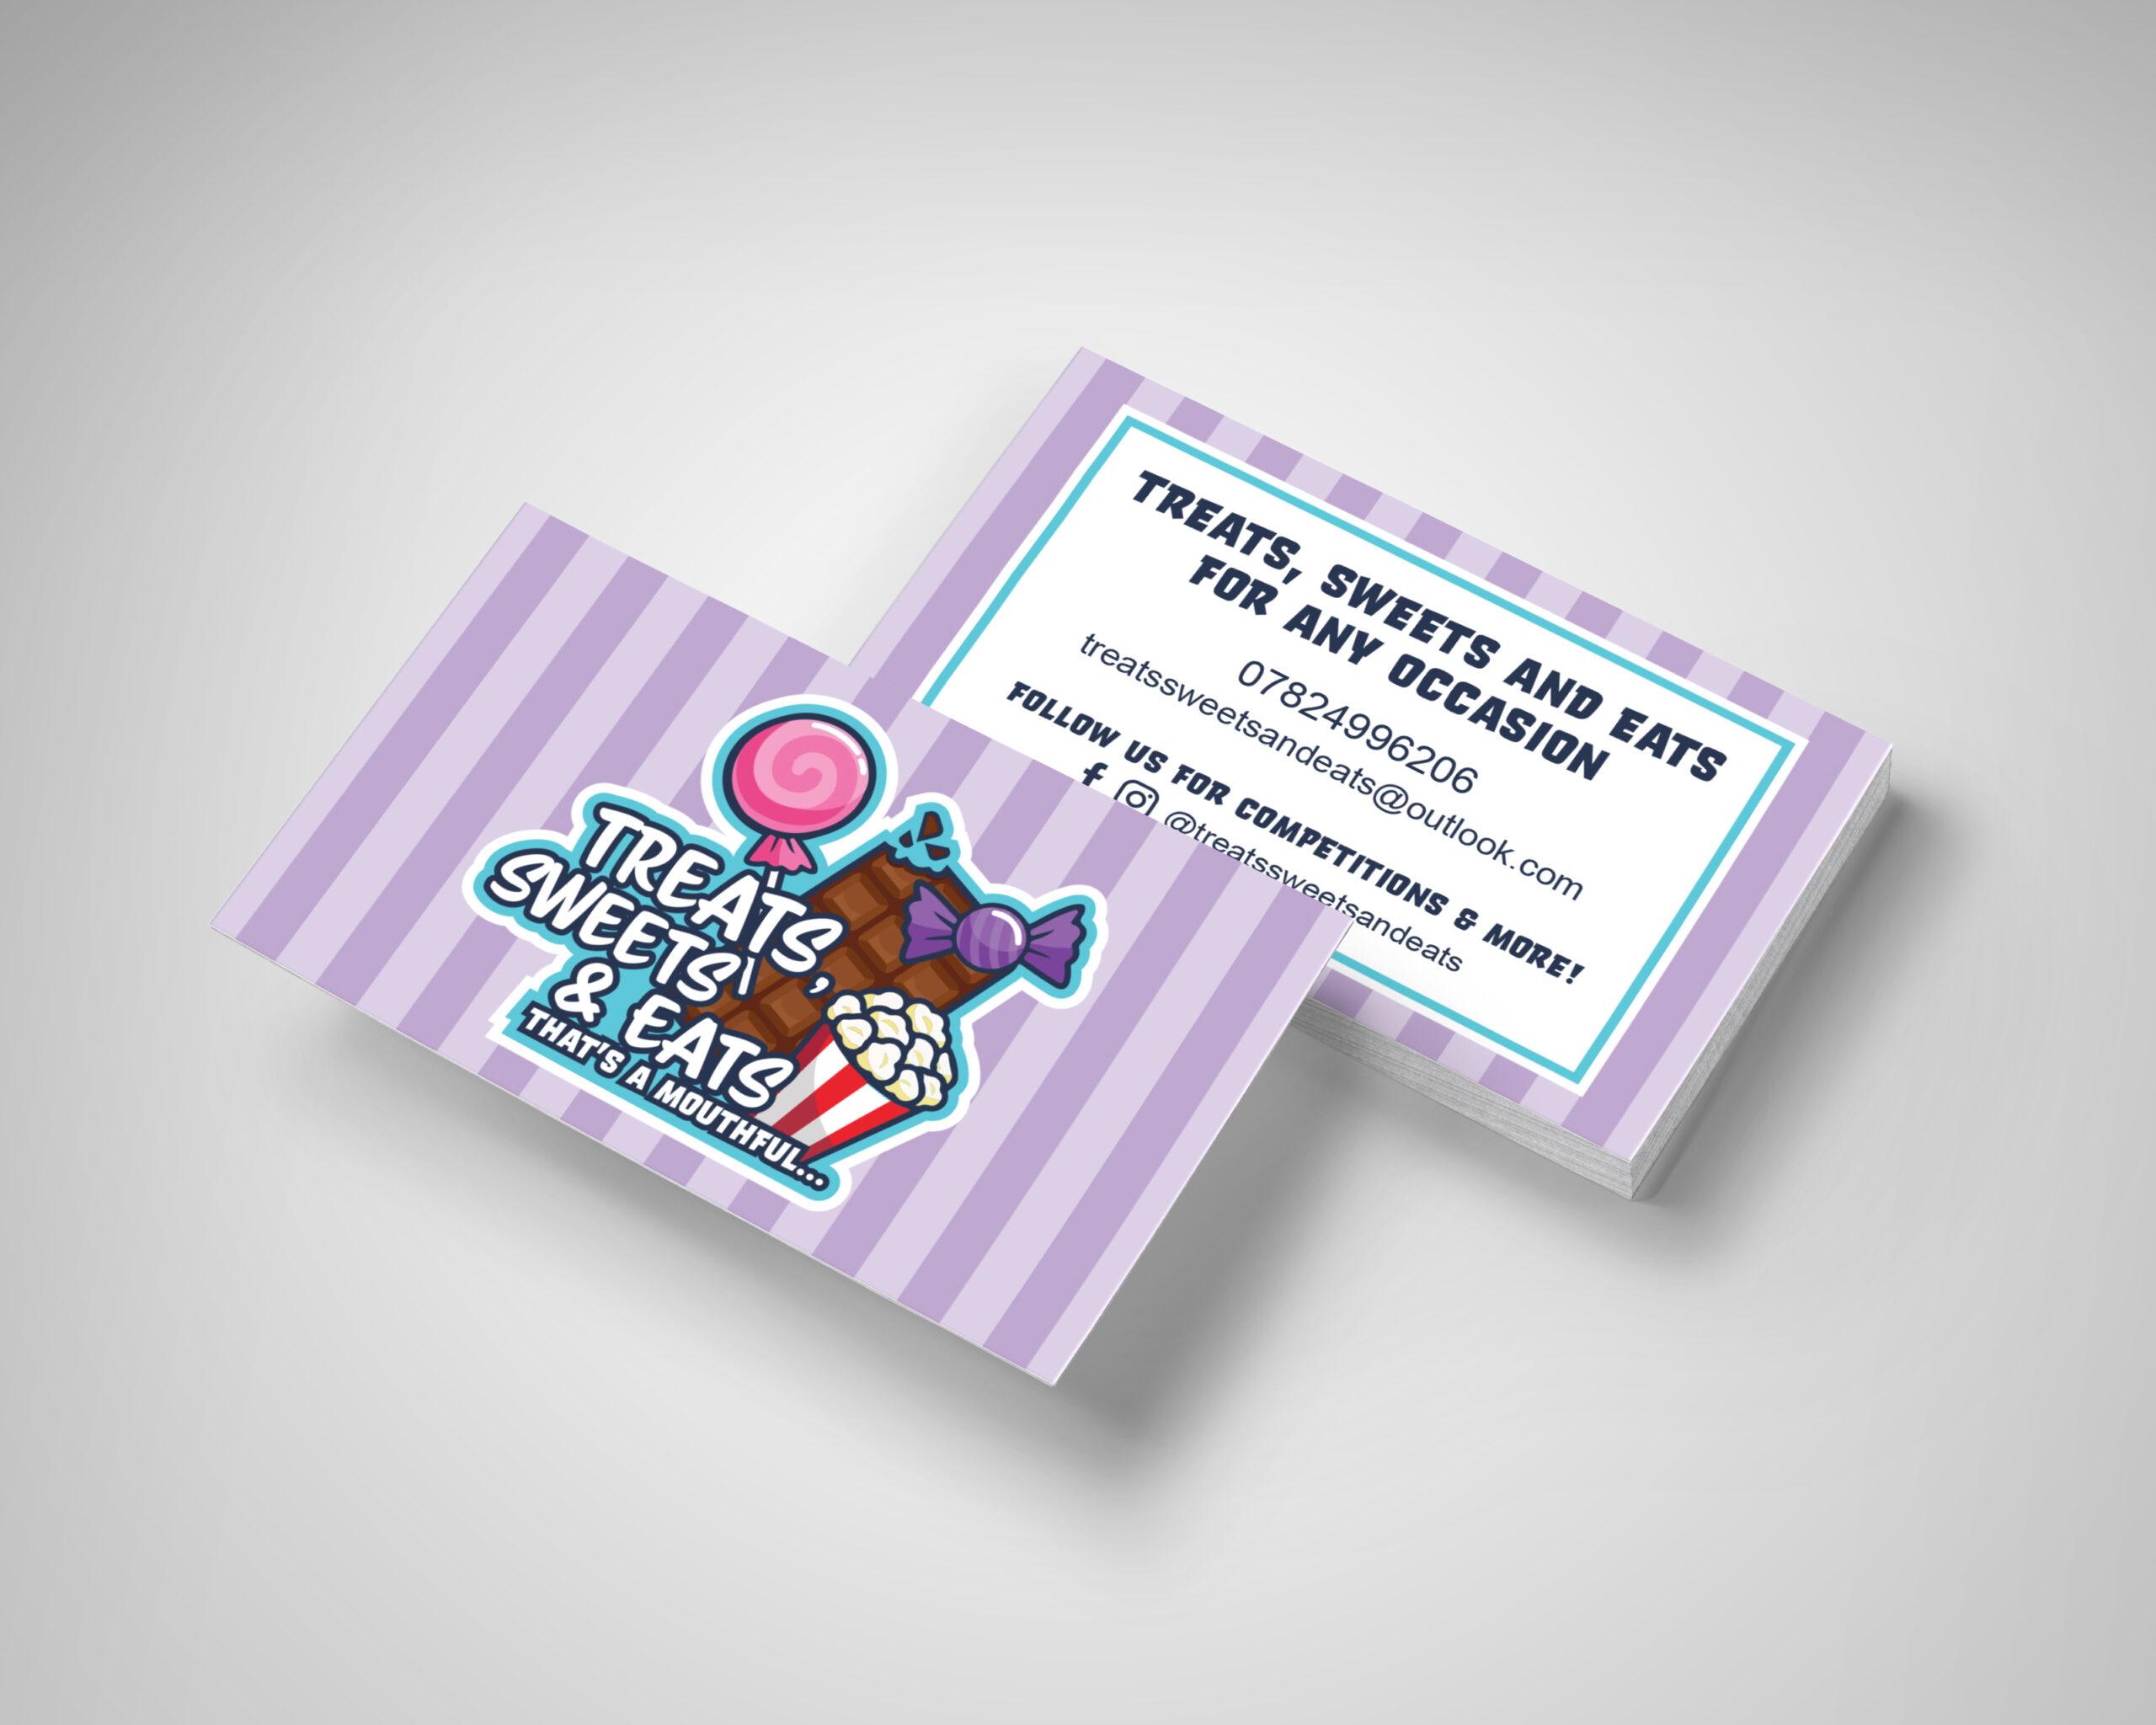 Treats, Sweets & Eats Business Card